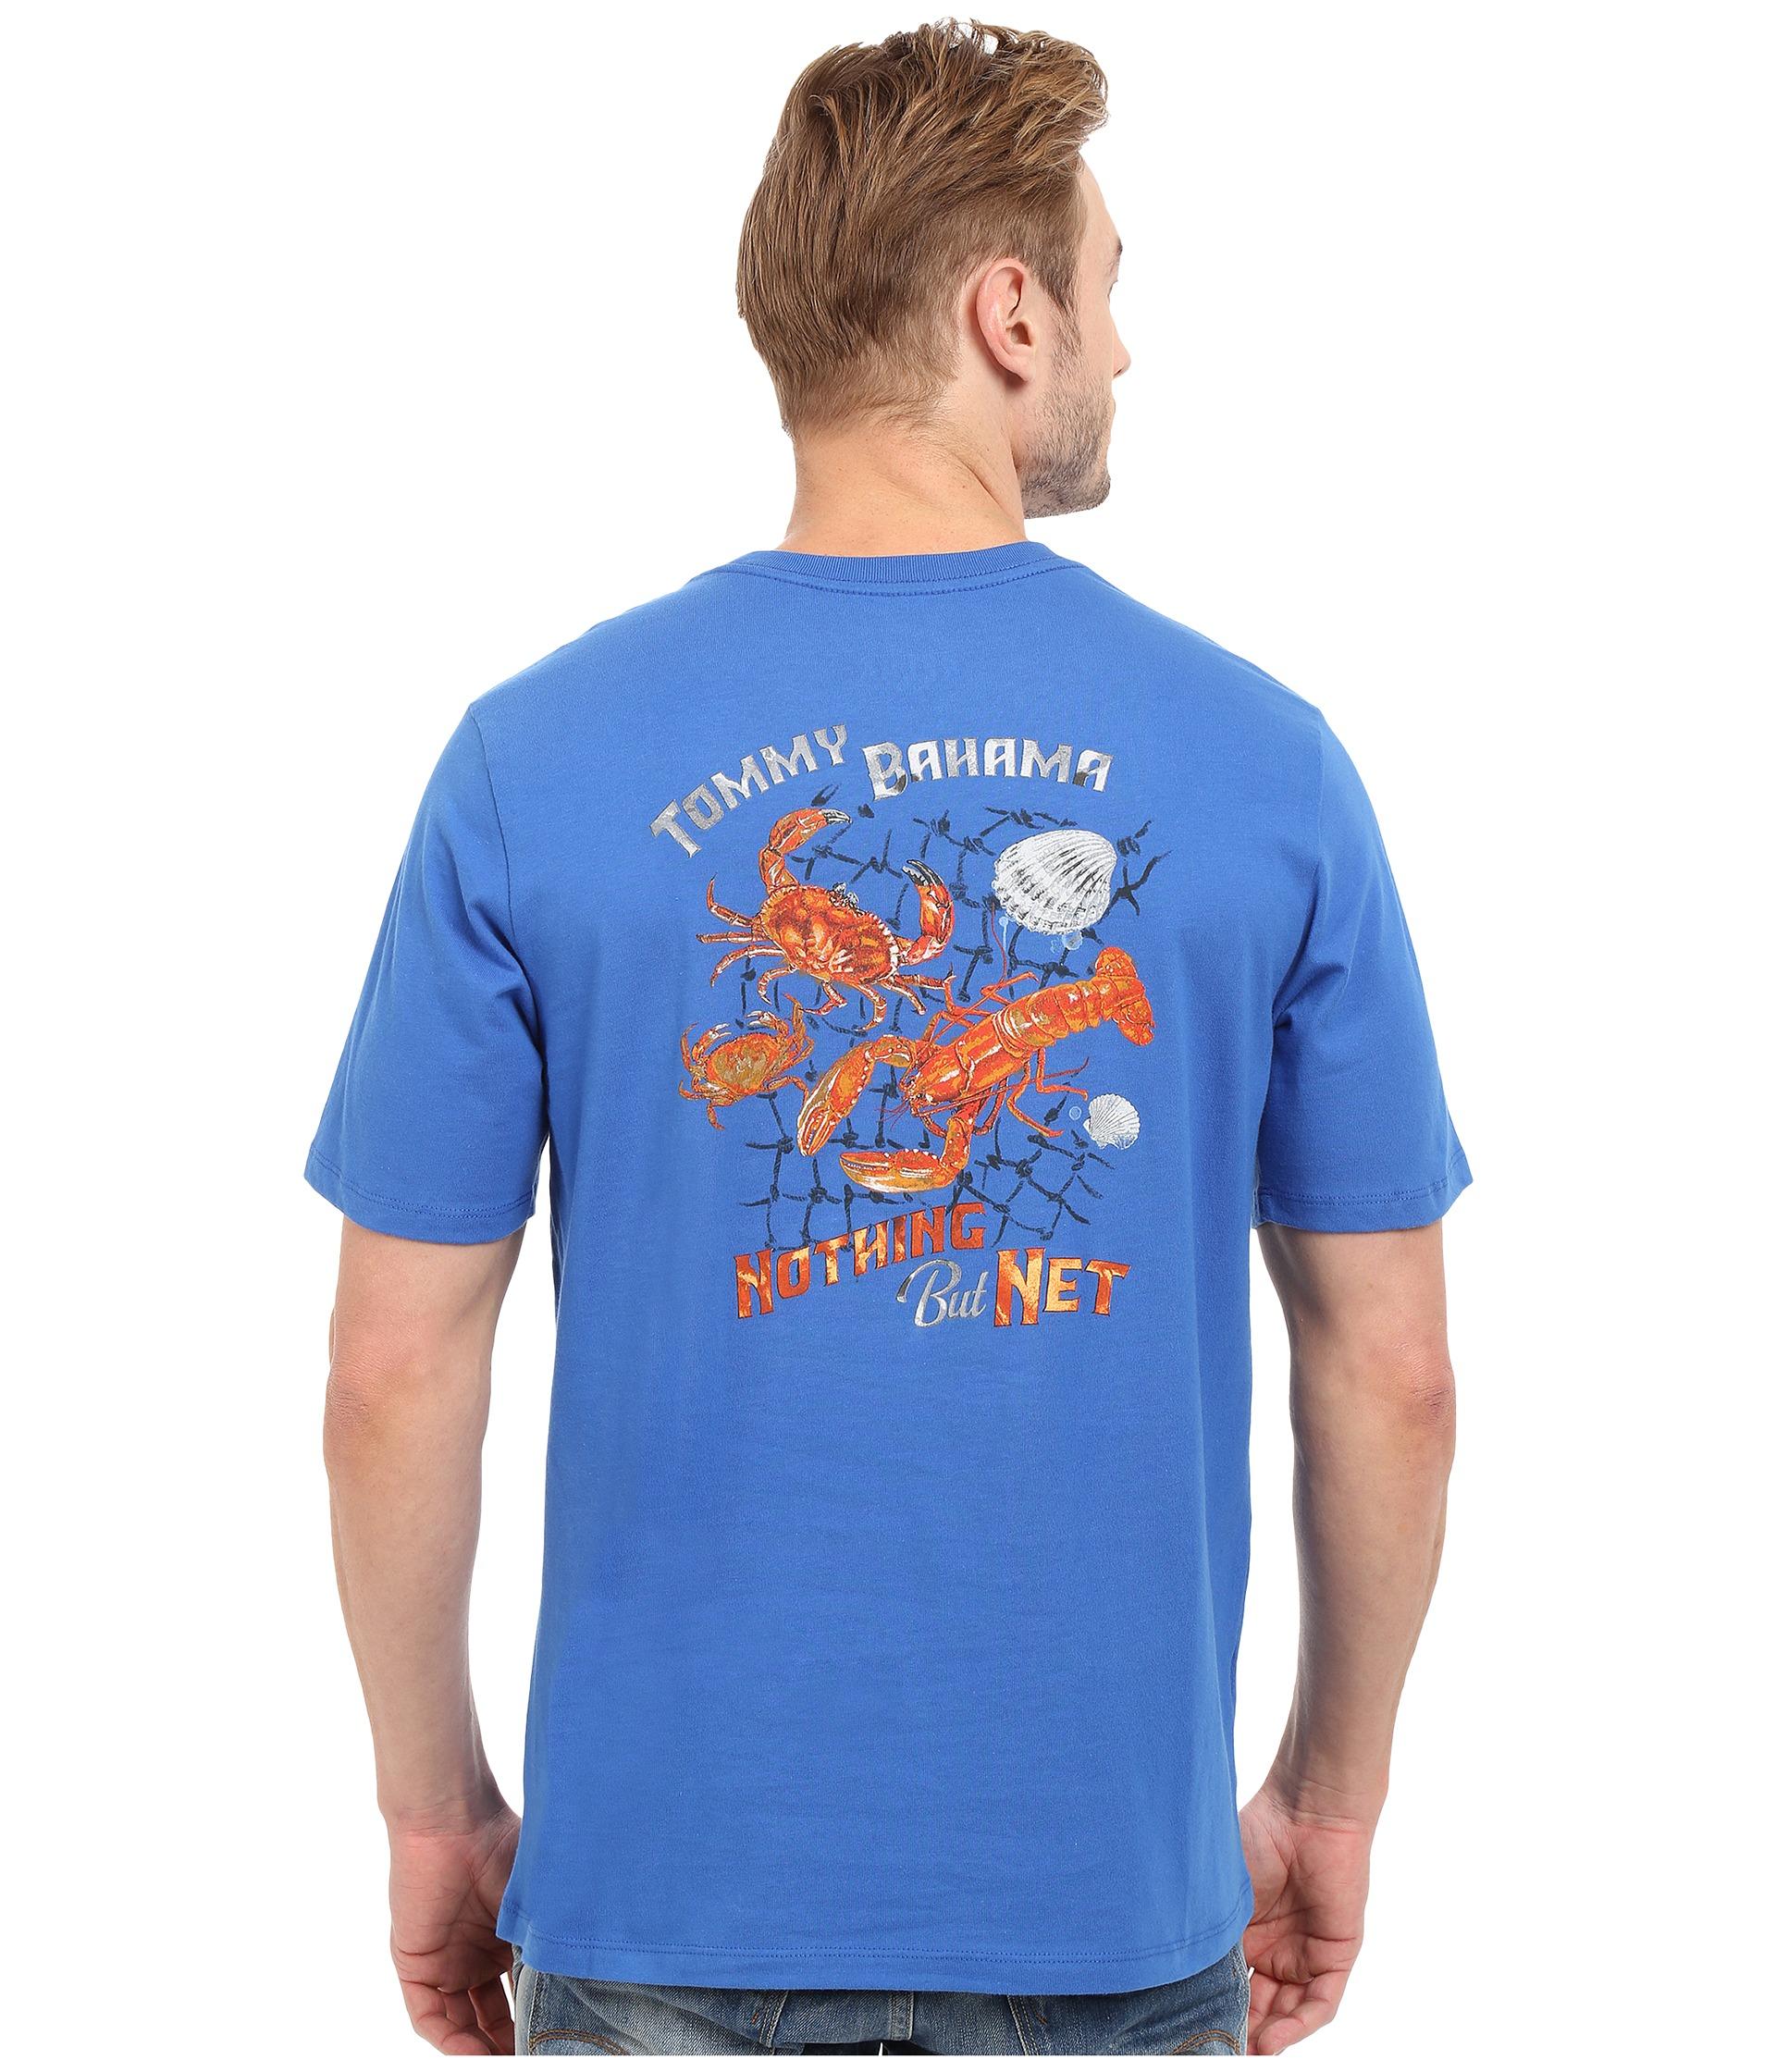 Tommy bahama nothing but net tee free for Custom tommy bahama shirts